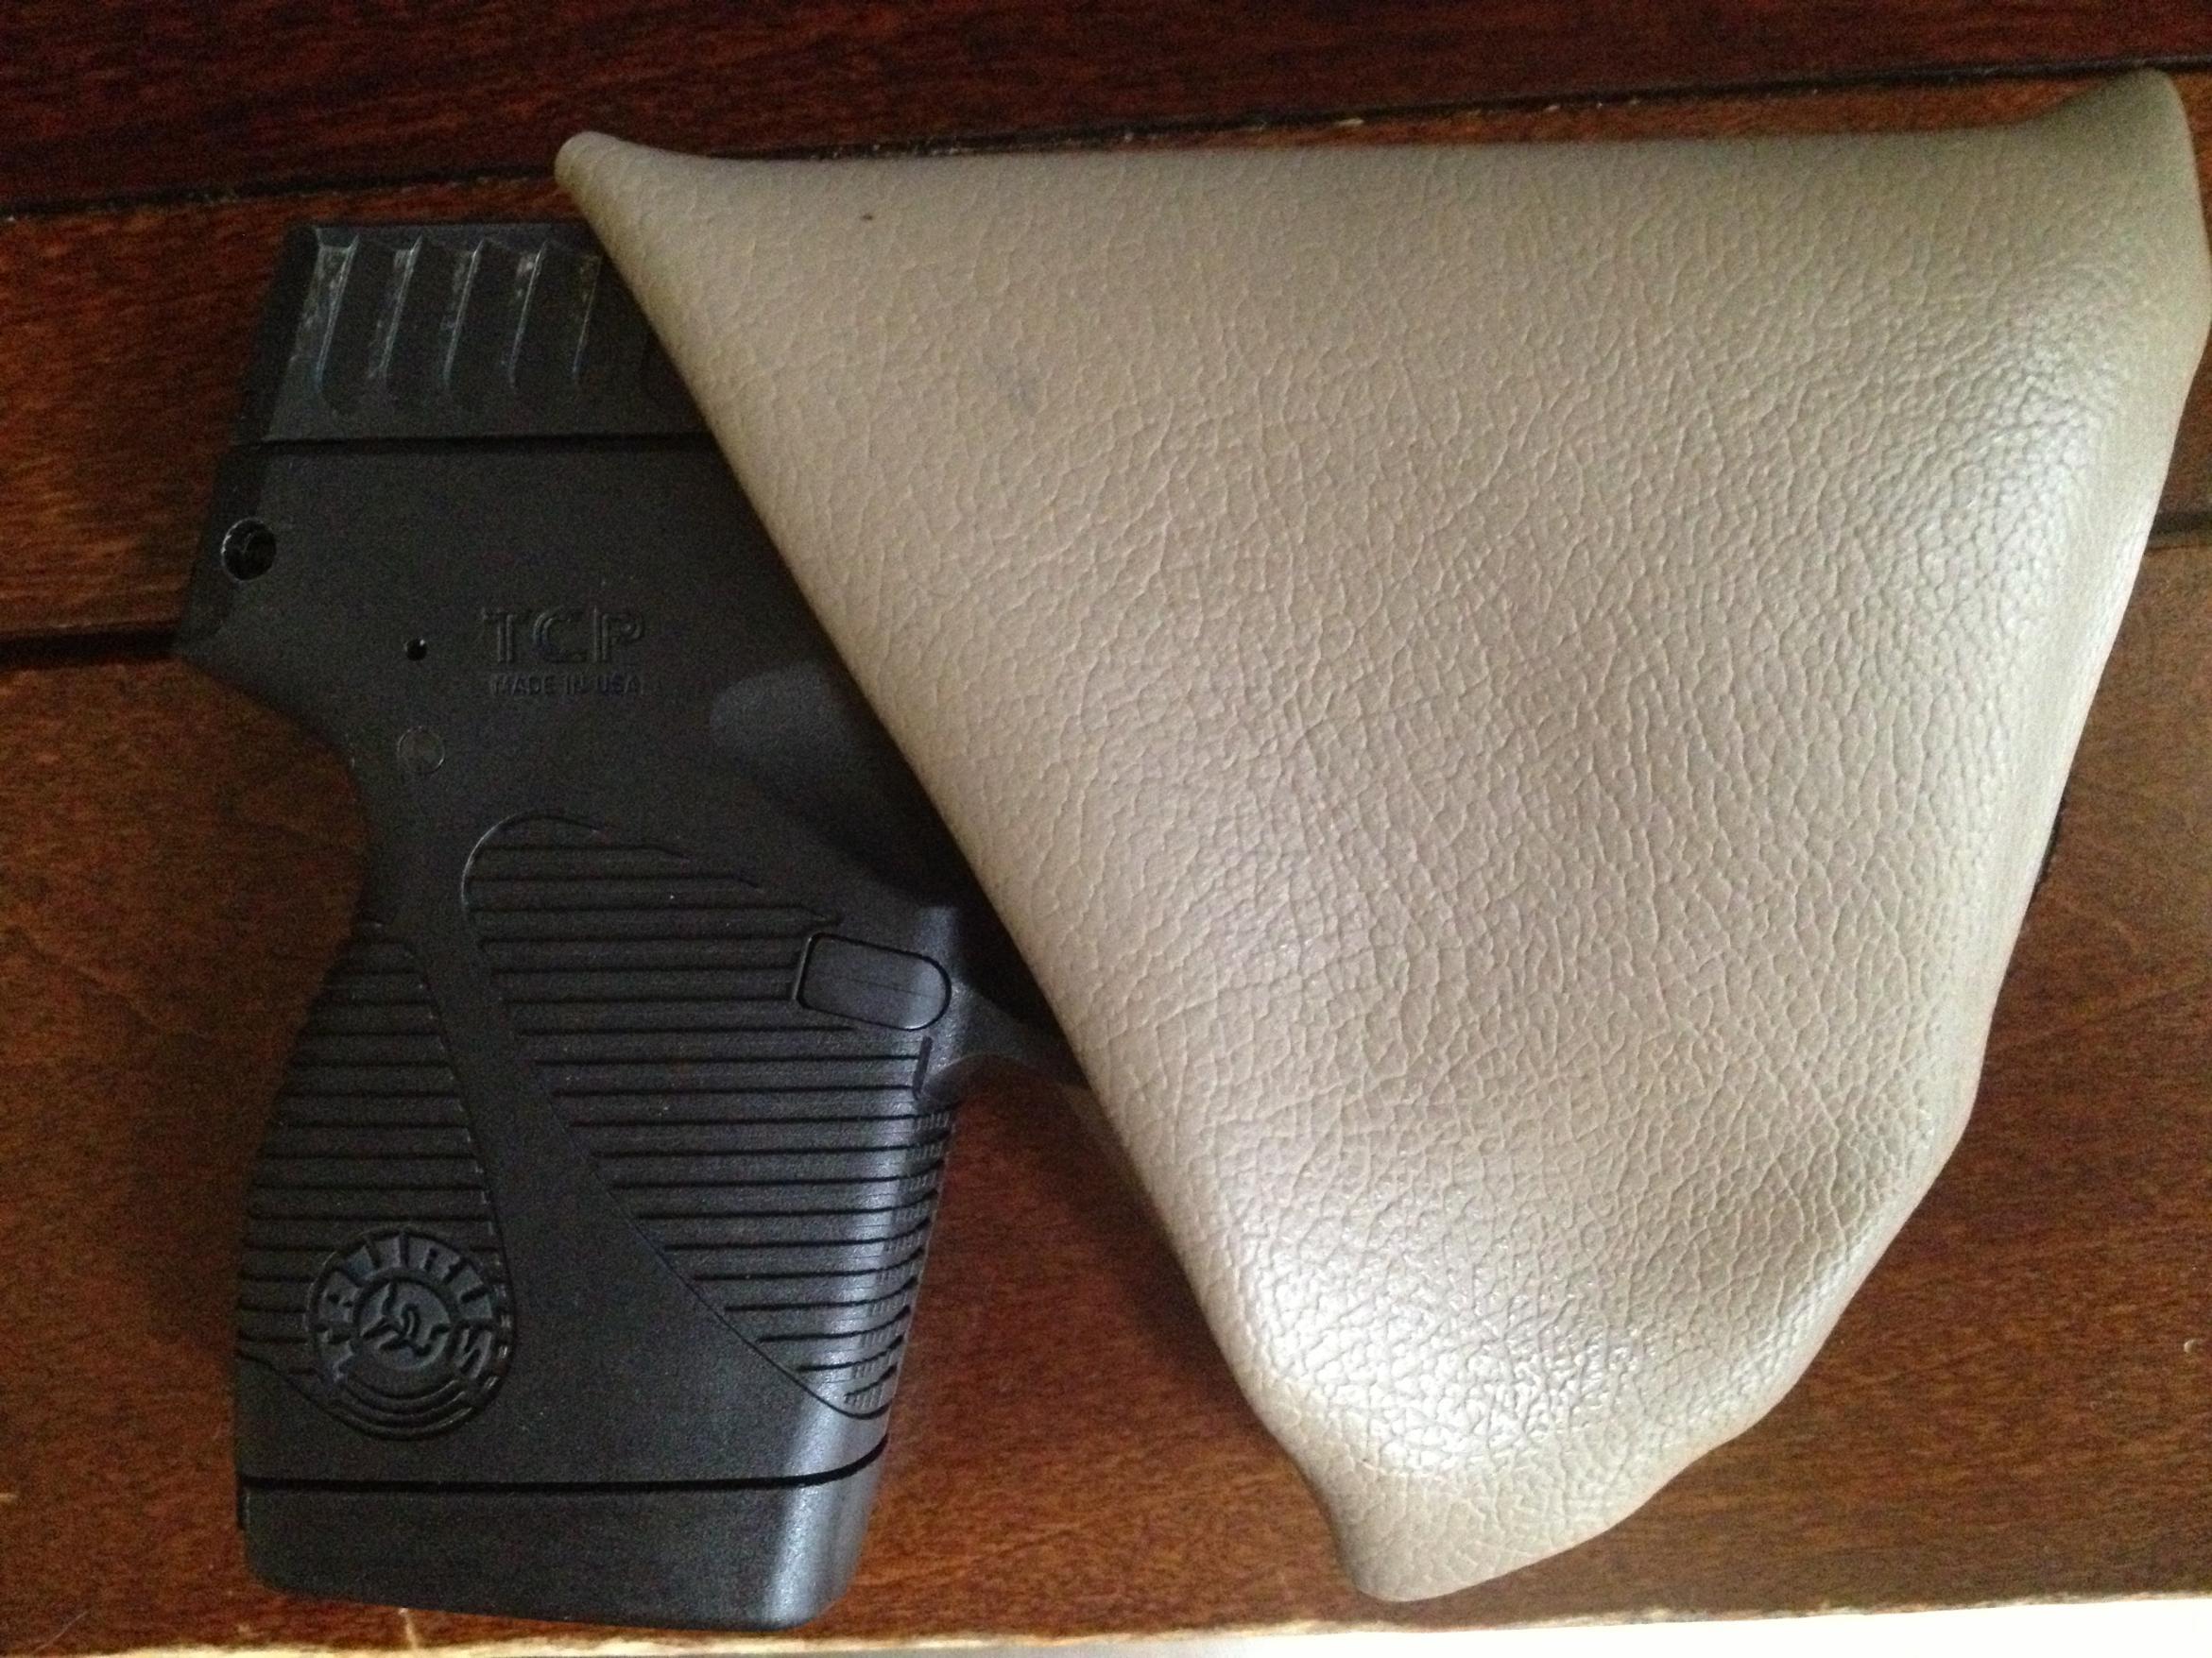 New Pocket Gun and Range Report-img_0580.jpg